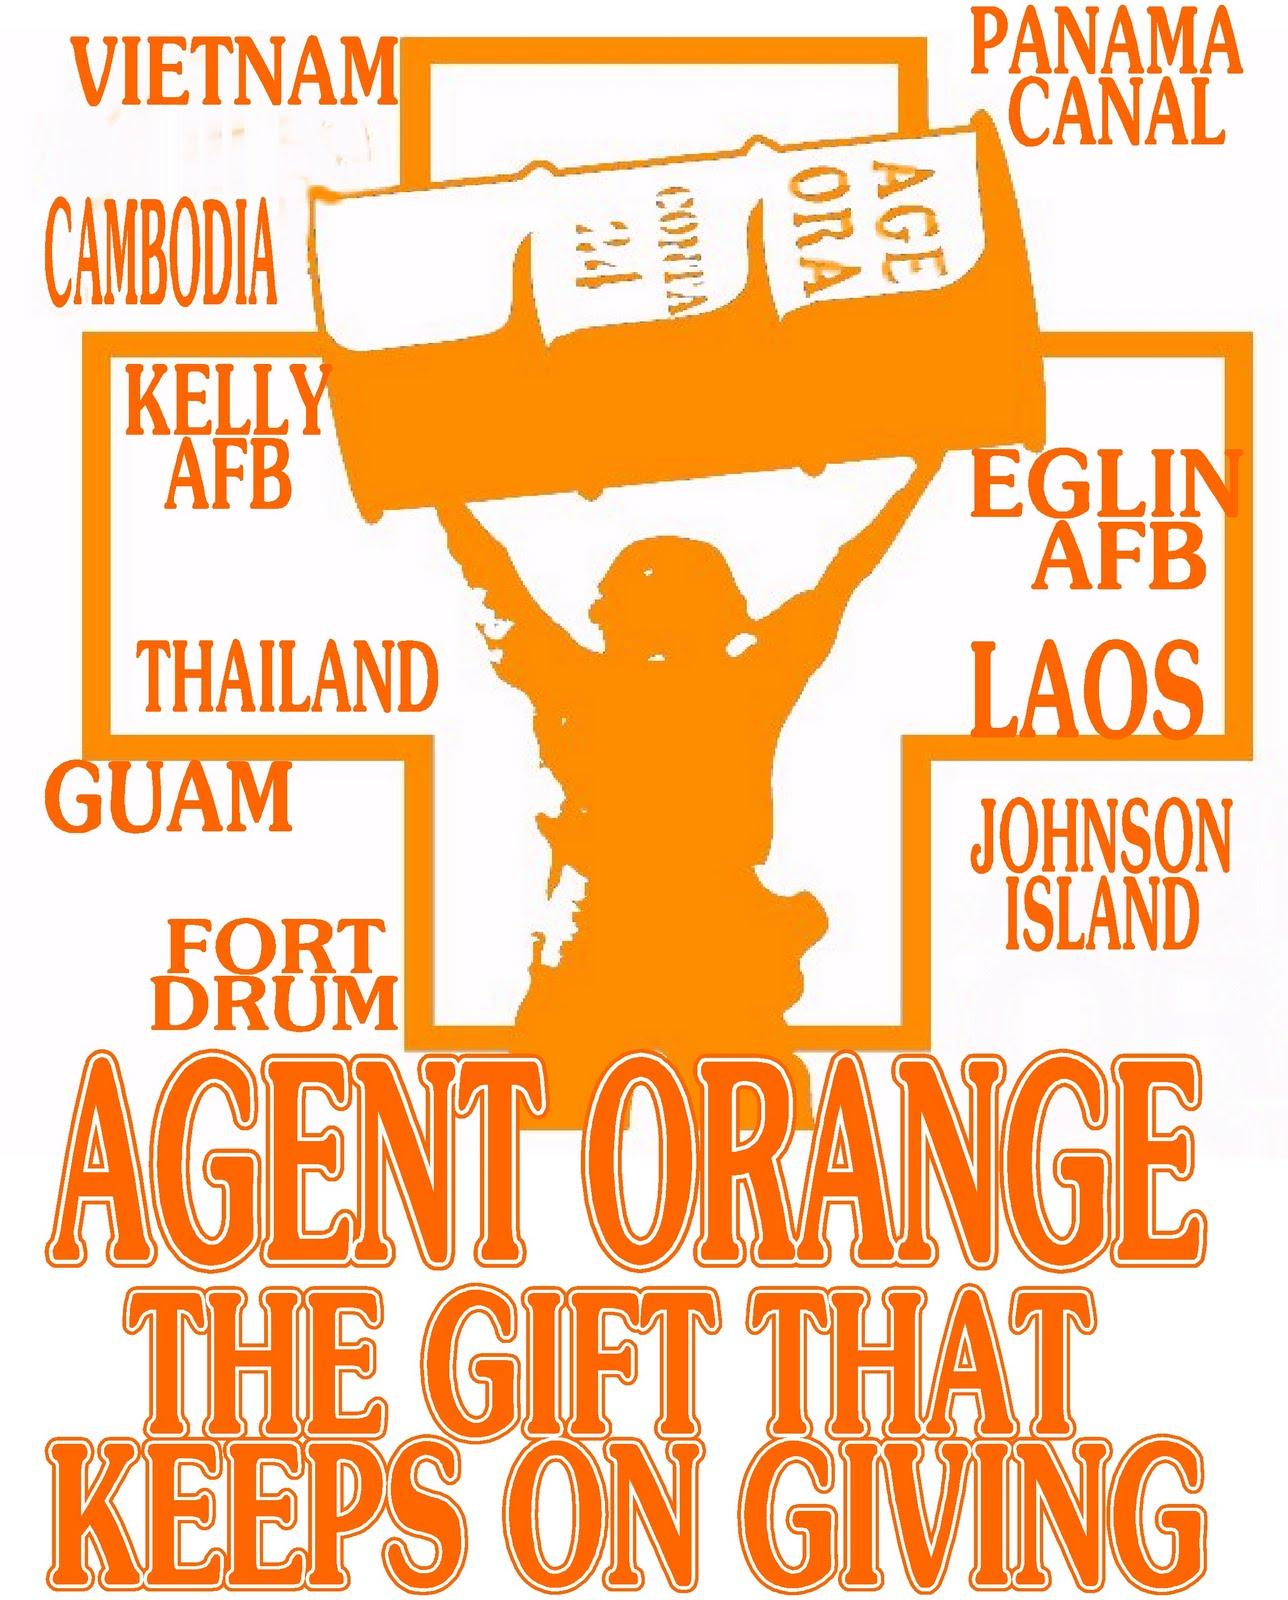 Agent orange legacy the stain of agent orange - Boutique orange agen ...